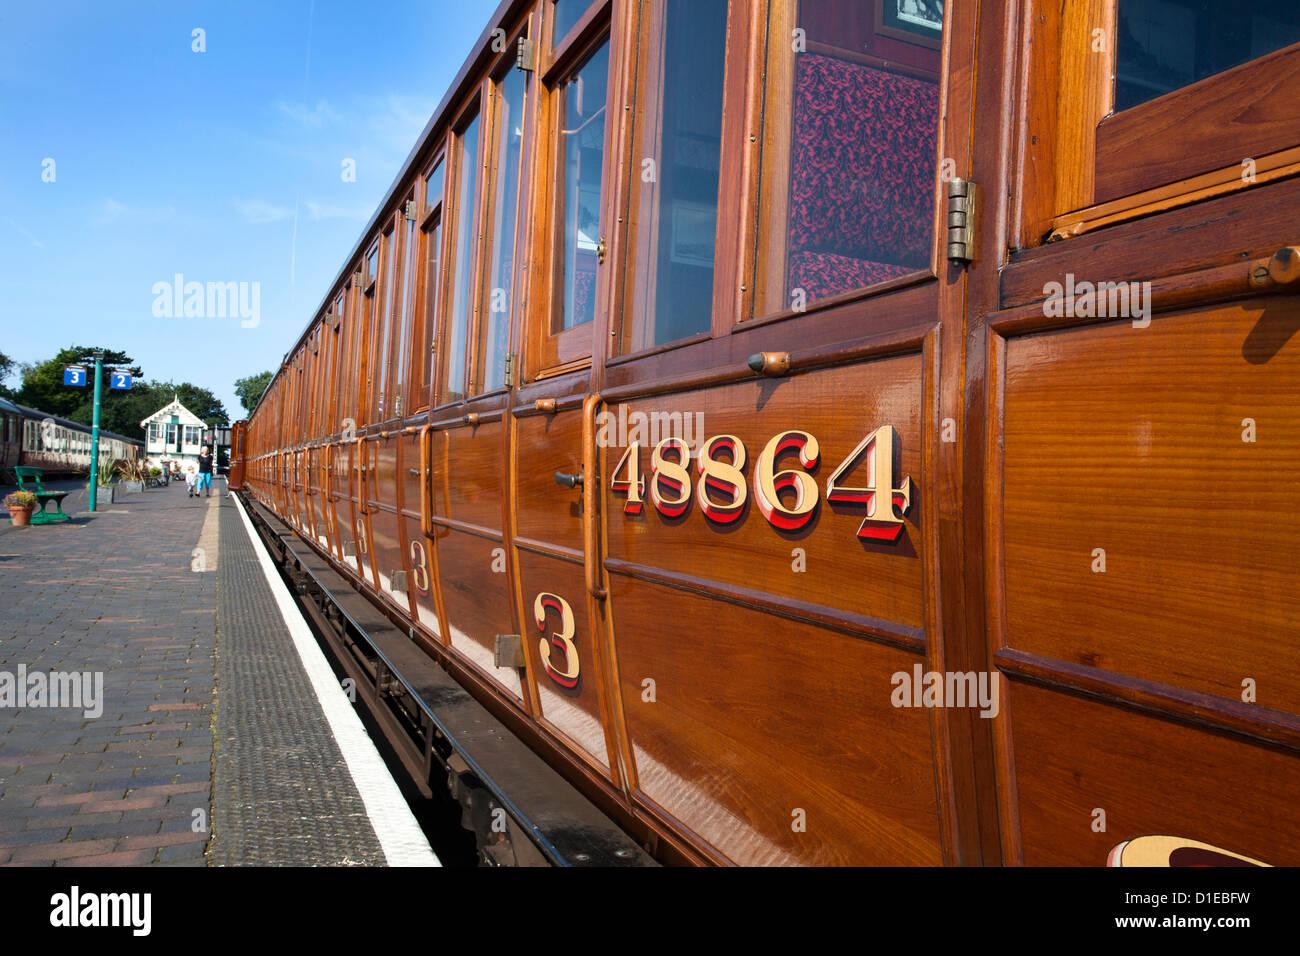 Vintage LNER rolling stock on the Poppy Line, North Norfolk Railway, at Sheringham, Norfolk, England, United Kingdom, - Stock Image